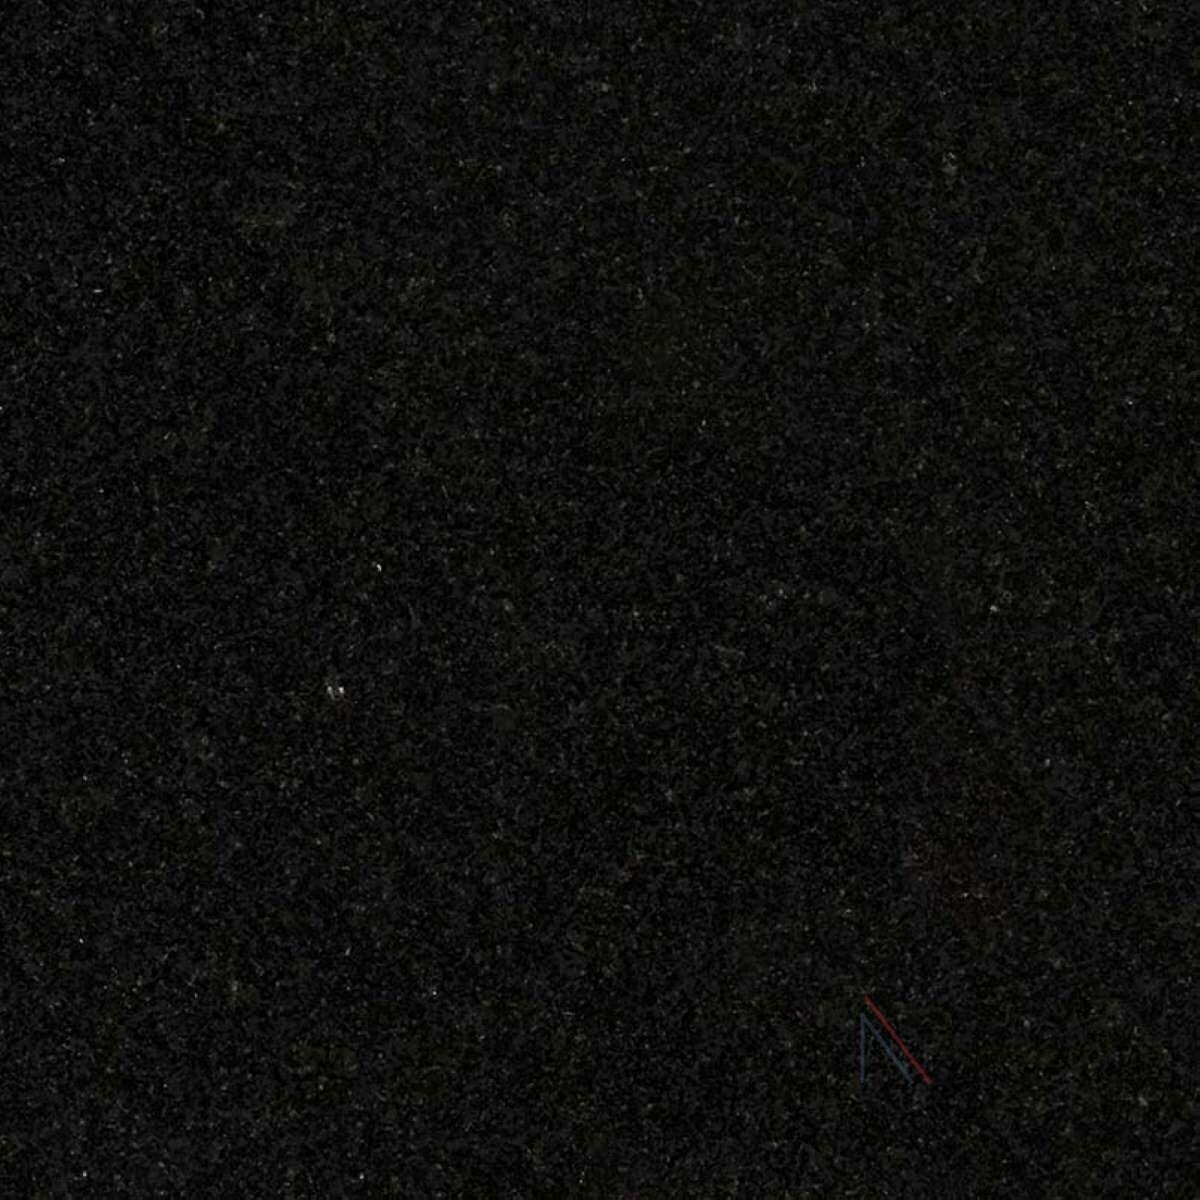 absolute-black-granite_1